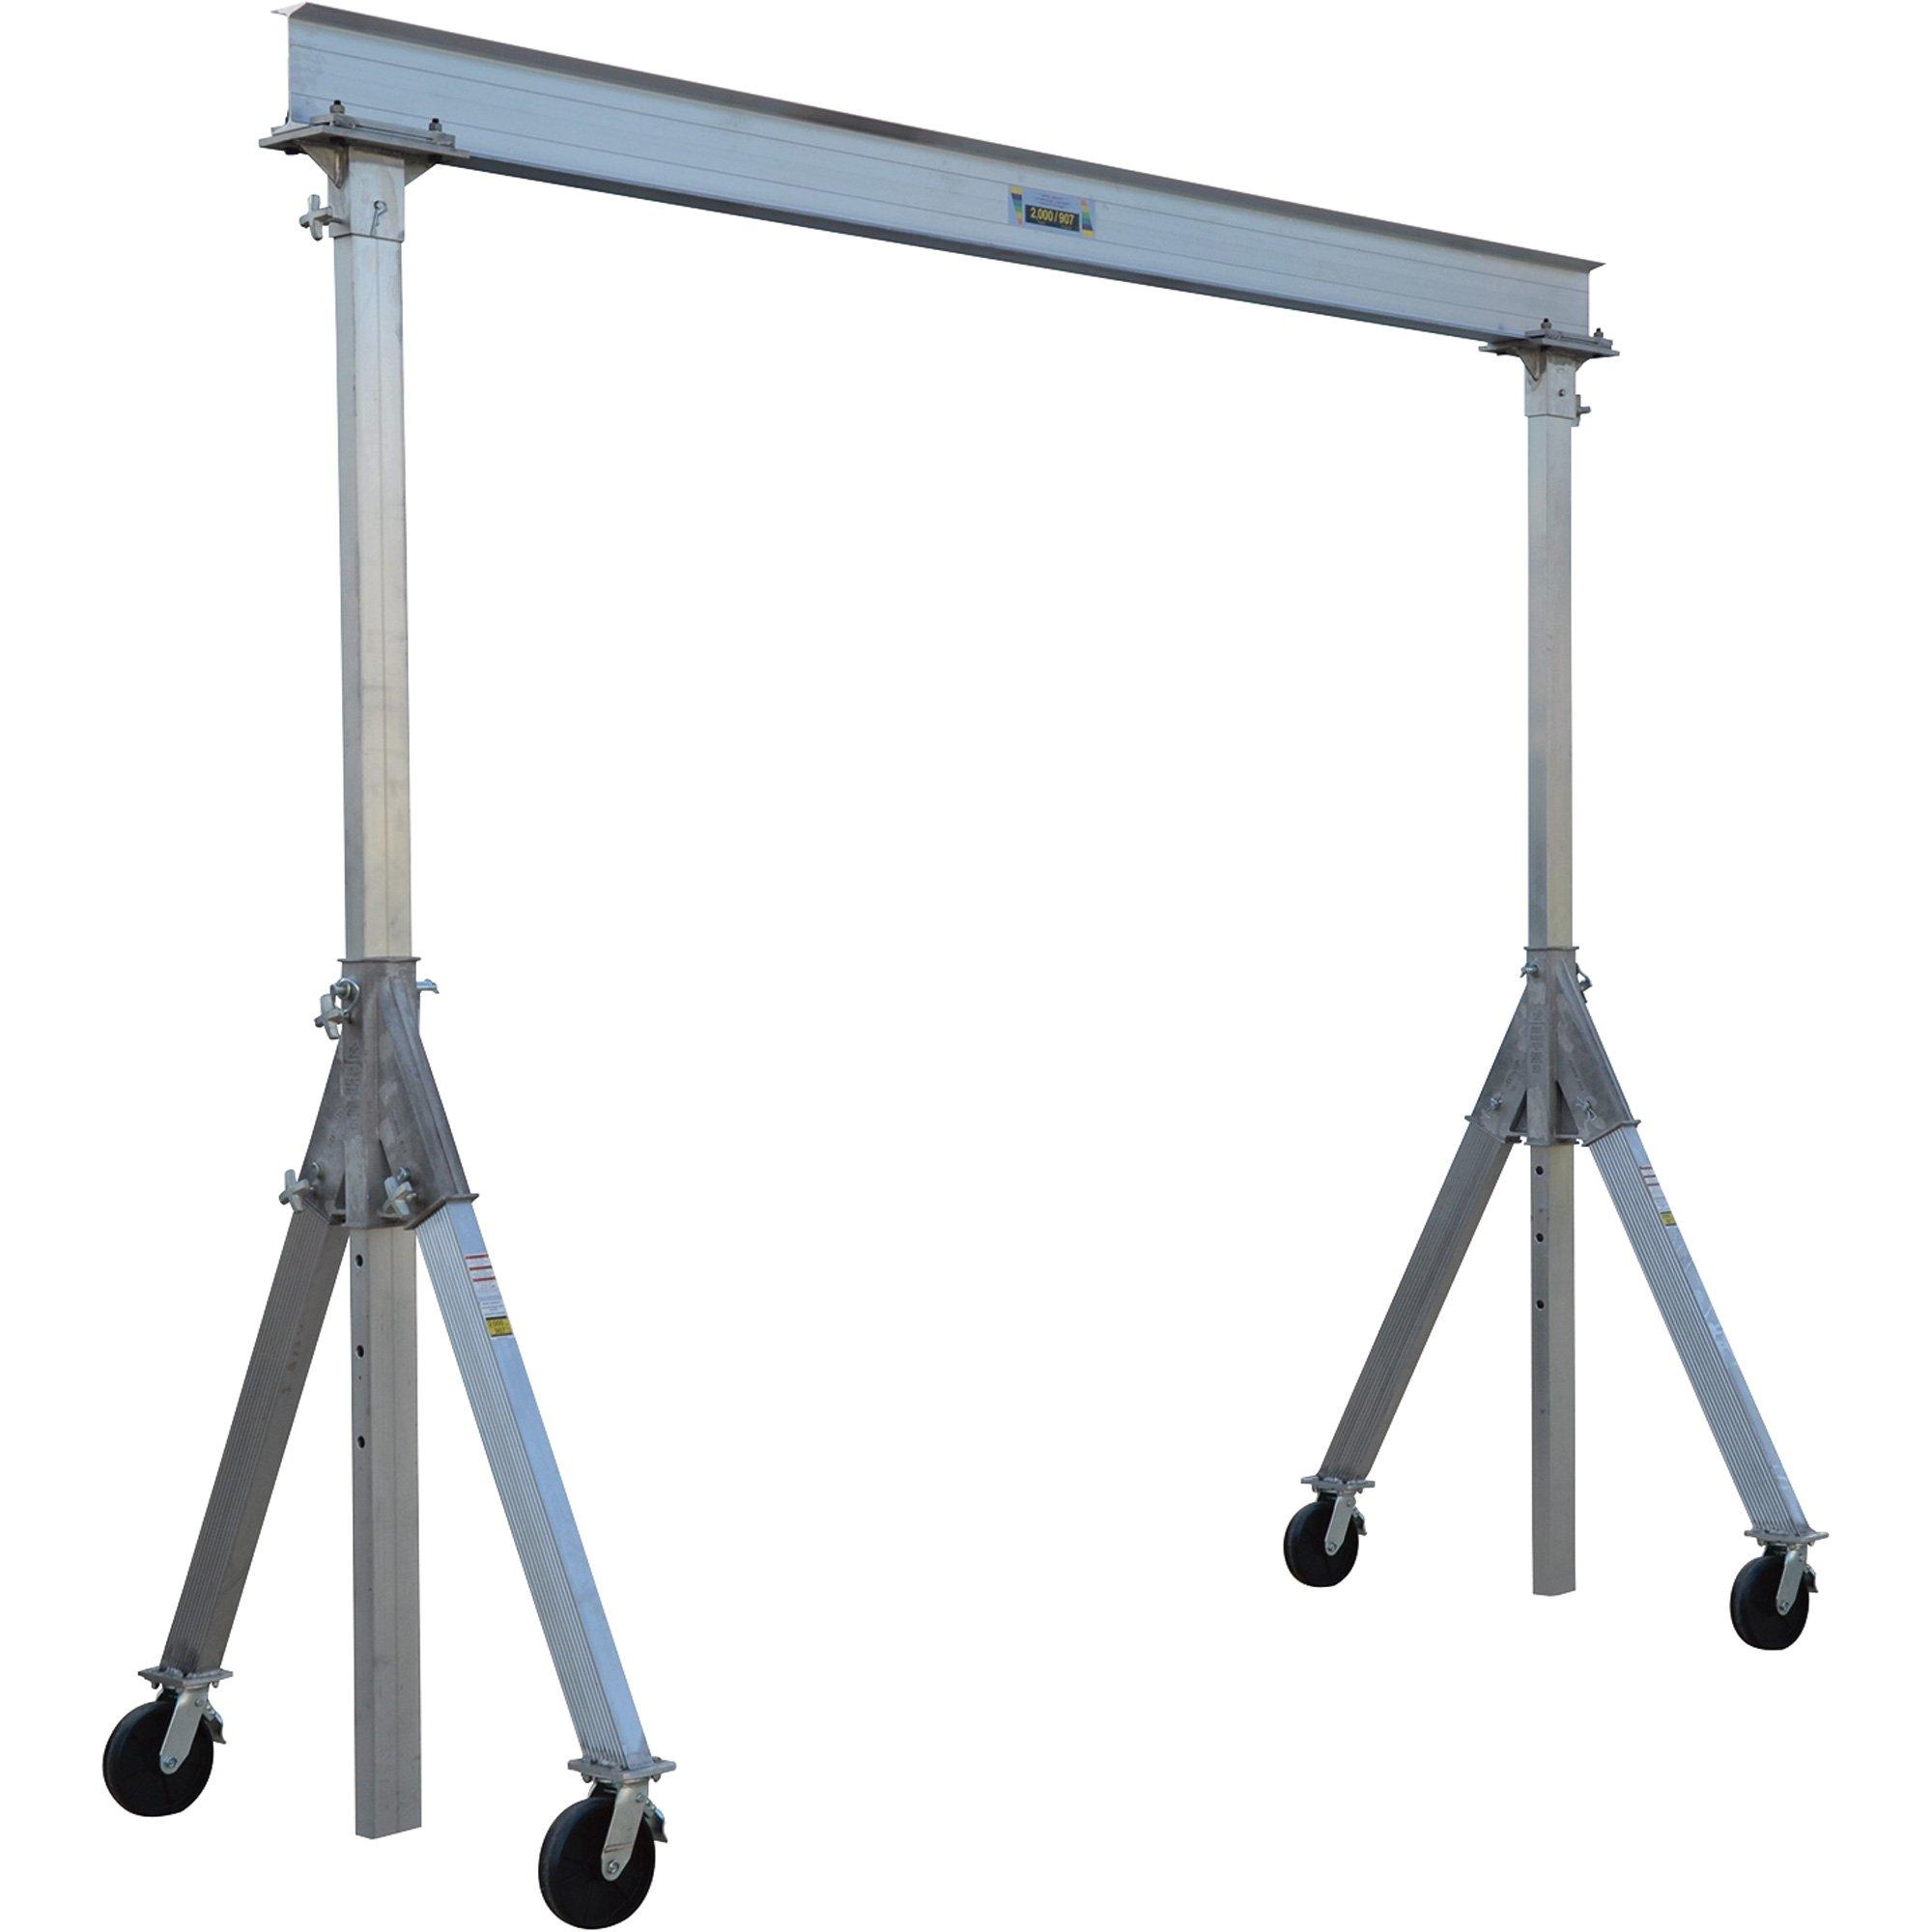 Vestil AHA-4-15-10 Aluminum Adjustable Gantry Crane, 4000 lb. Capacity, 15' Overall Beam, 96'' Usable Trolley Travel Distance, Under I-Beam Range 92''-120'', 132-1/8'' Height